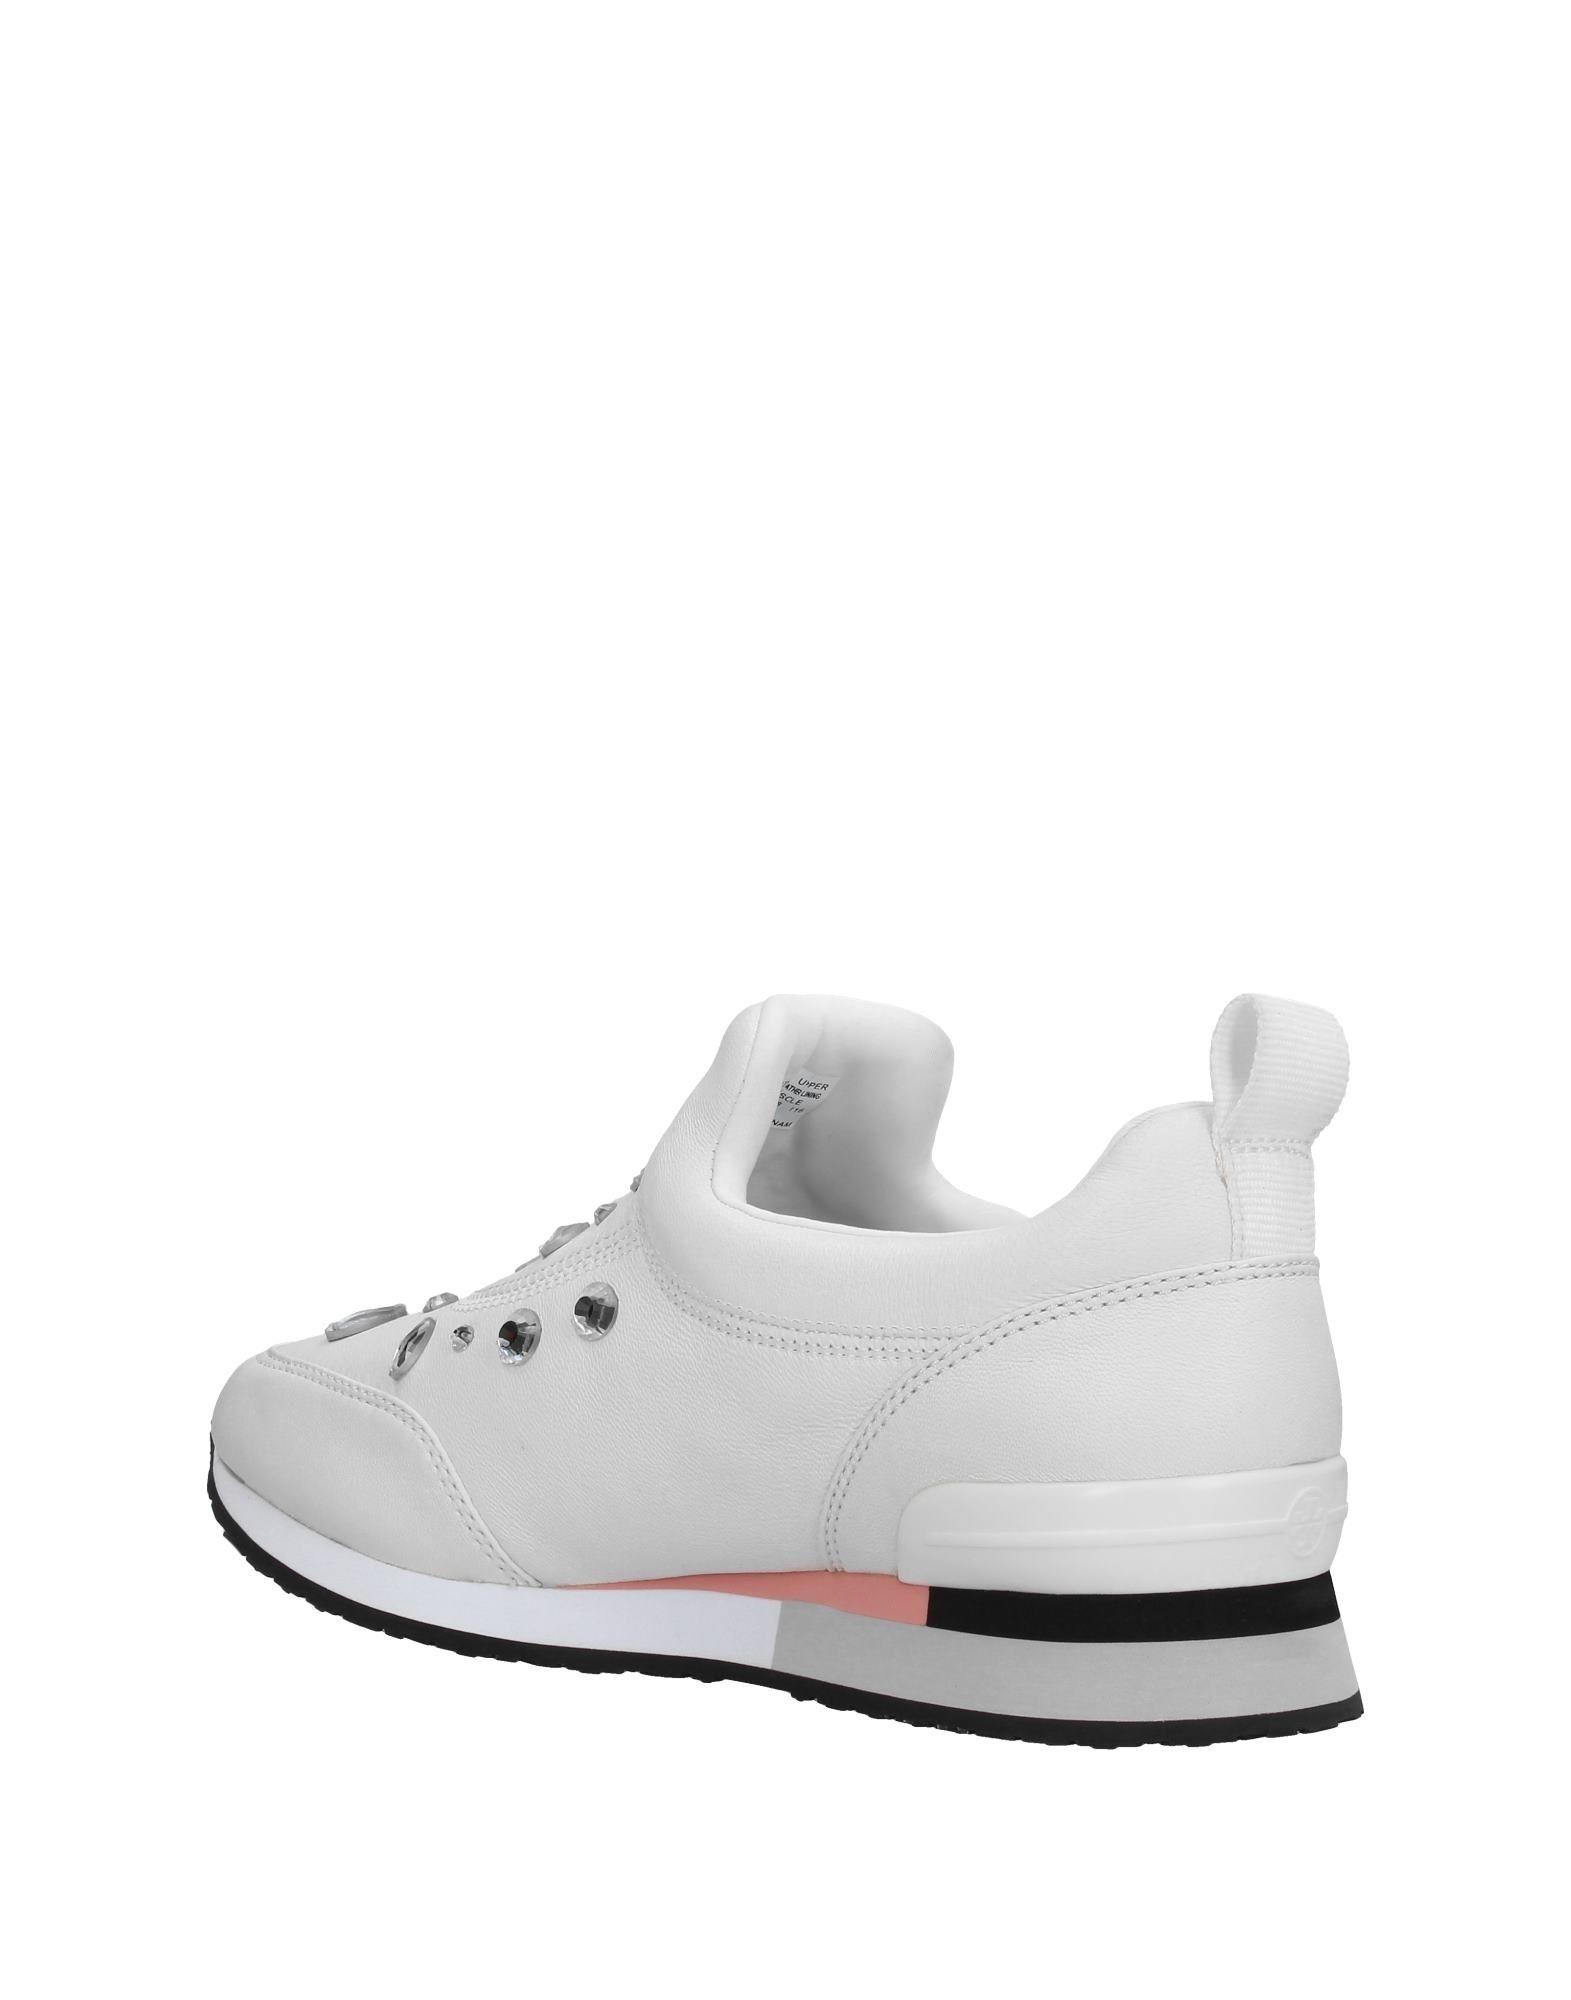 Tory Burch Sneakers - Women Tory Tory Tory Burch Sneakers online on  Canada - 11355359WM b47947